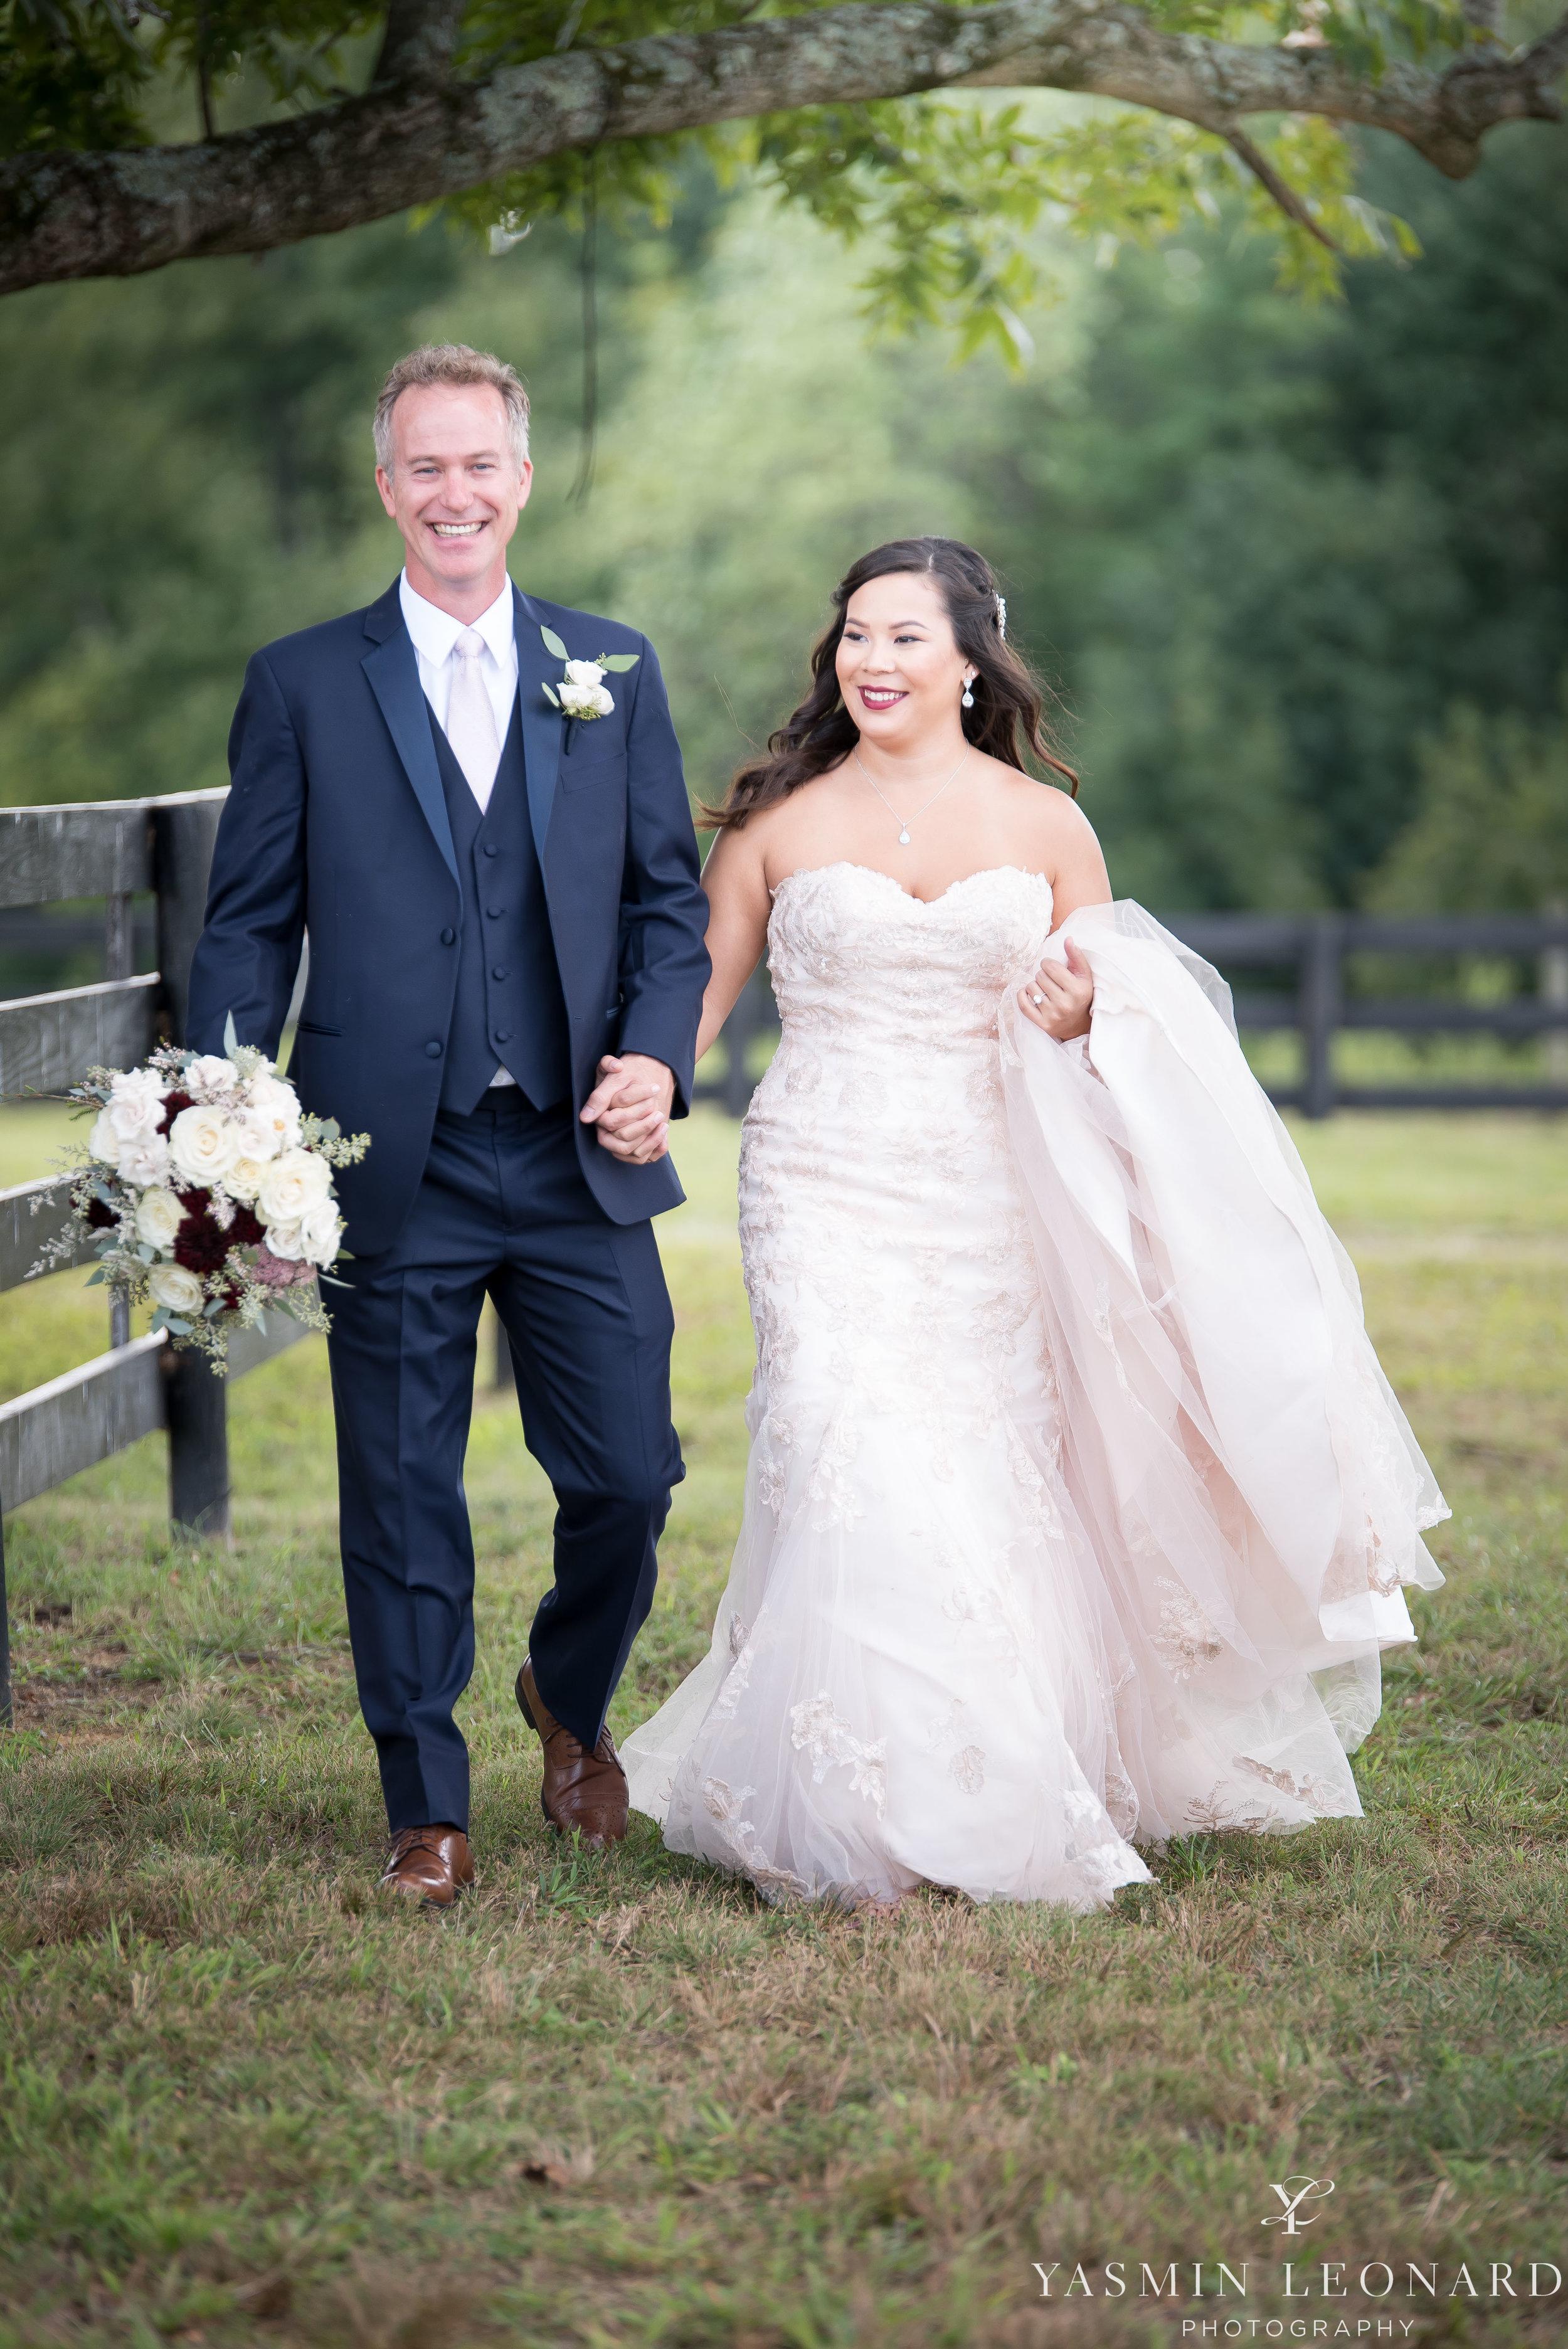 Mason Ridge   Liberty, NC   Aylissa and John   Yasmin Leonard Photography-45.jpg